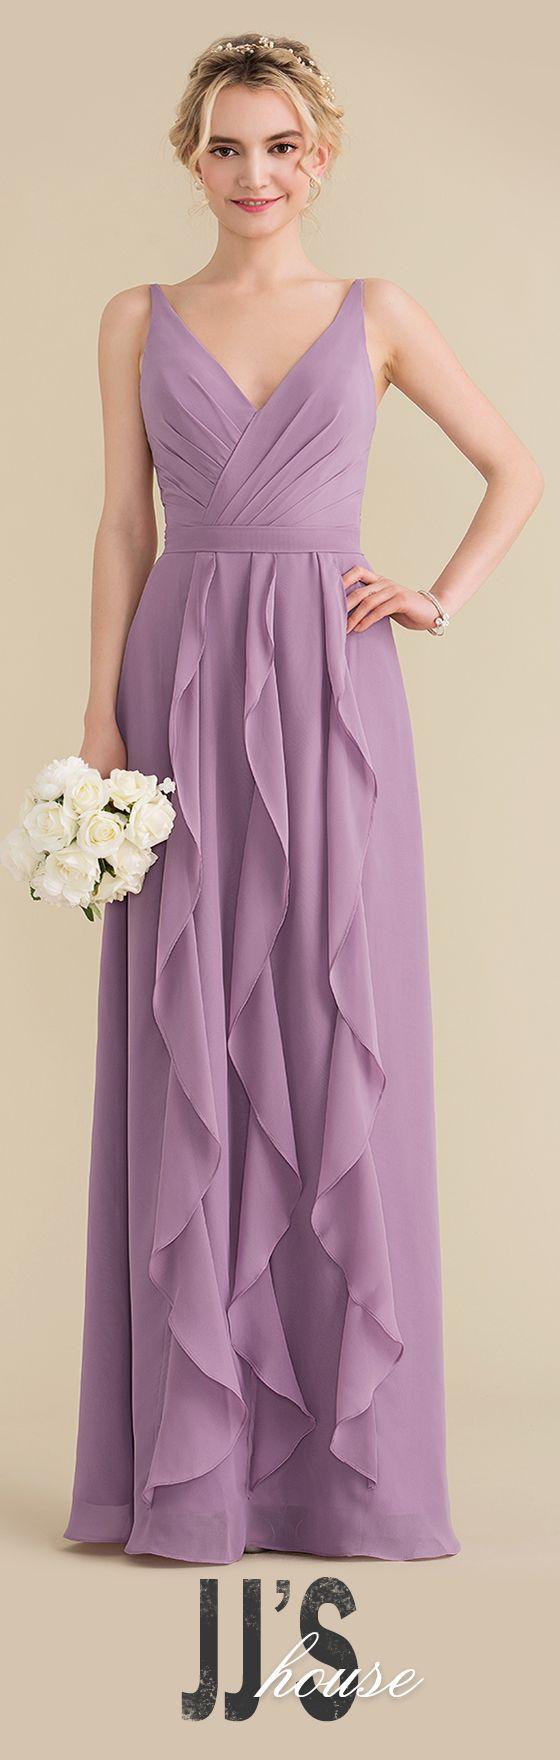 [US$ 122.00] A-Line V-neck Floor-Length Chiffon Bridesmaid ...